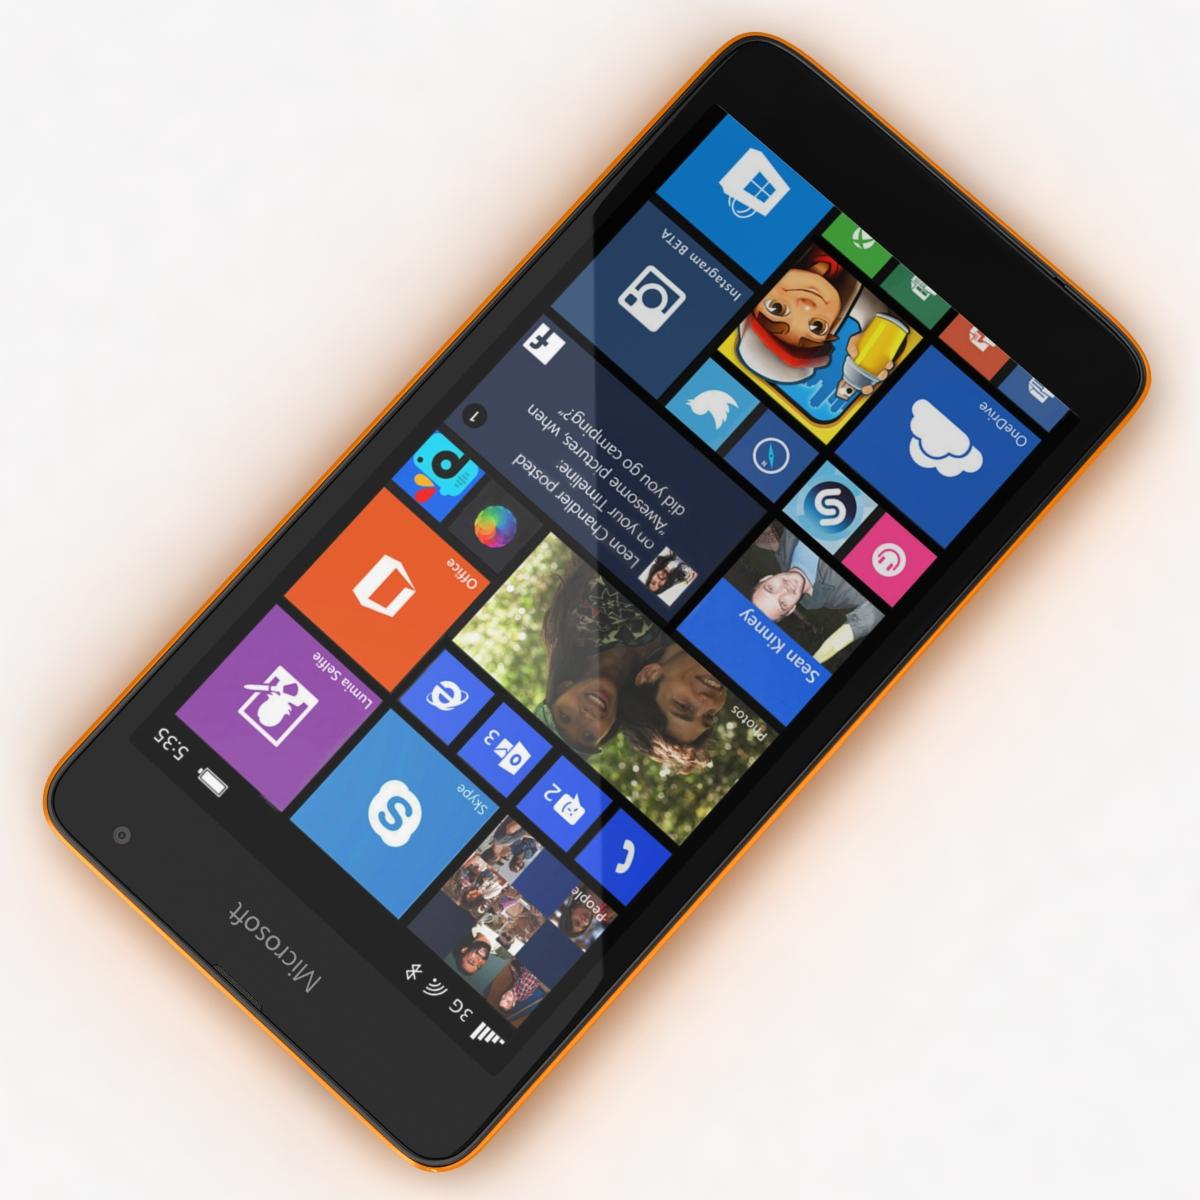 microsoft lumia 535 and dual sim orange 3d model 3ds max fbx c4d obj 204109